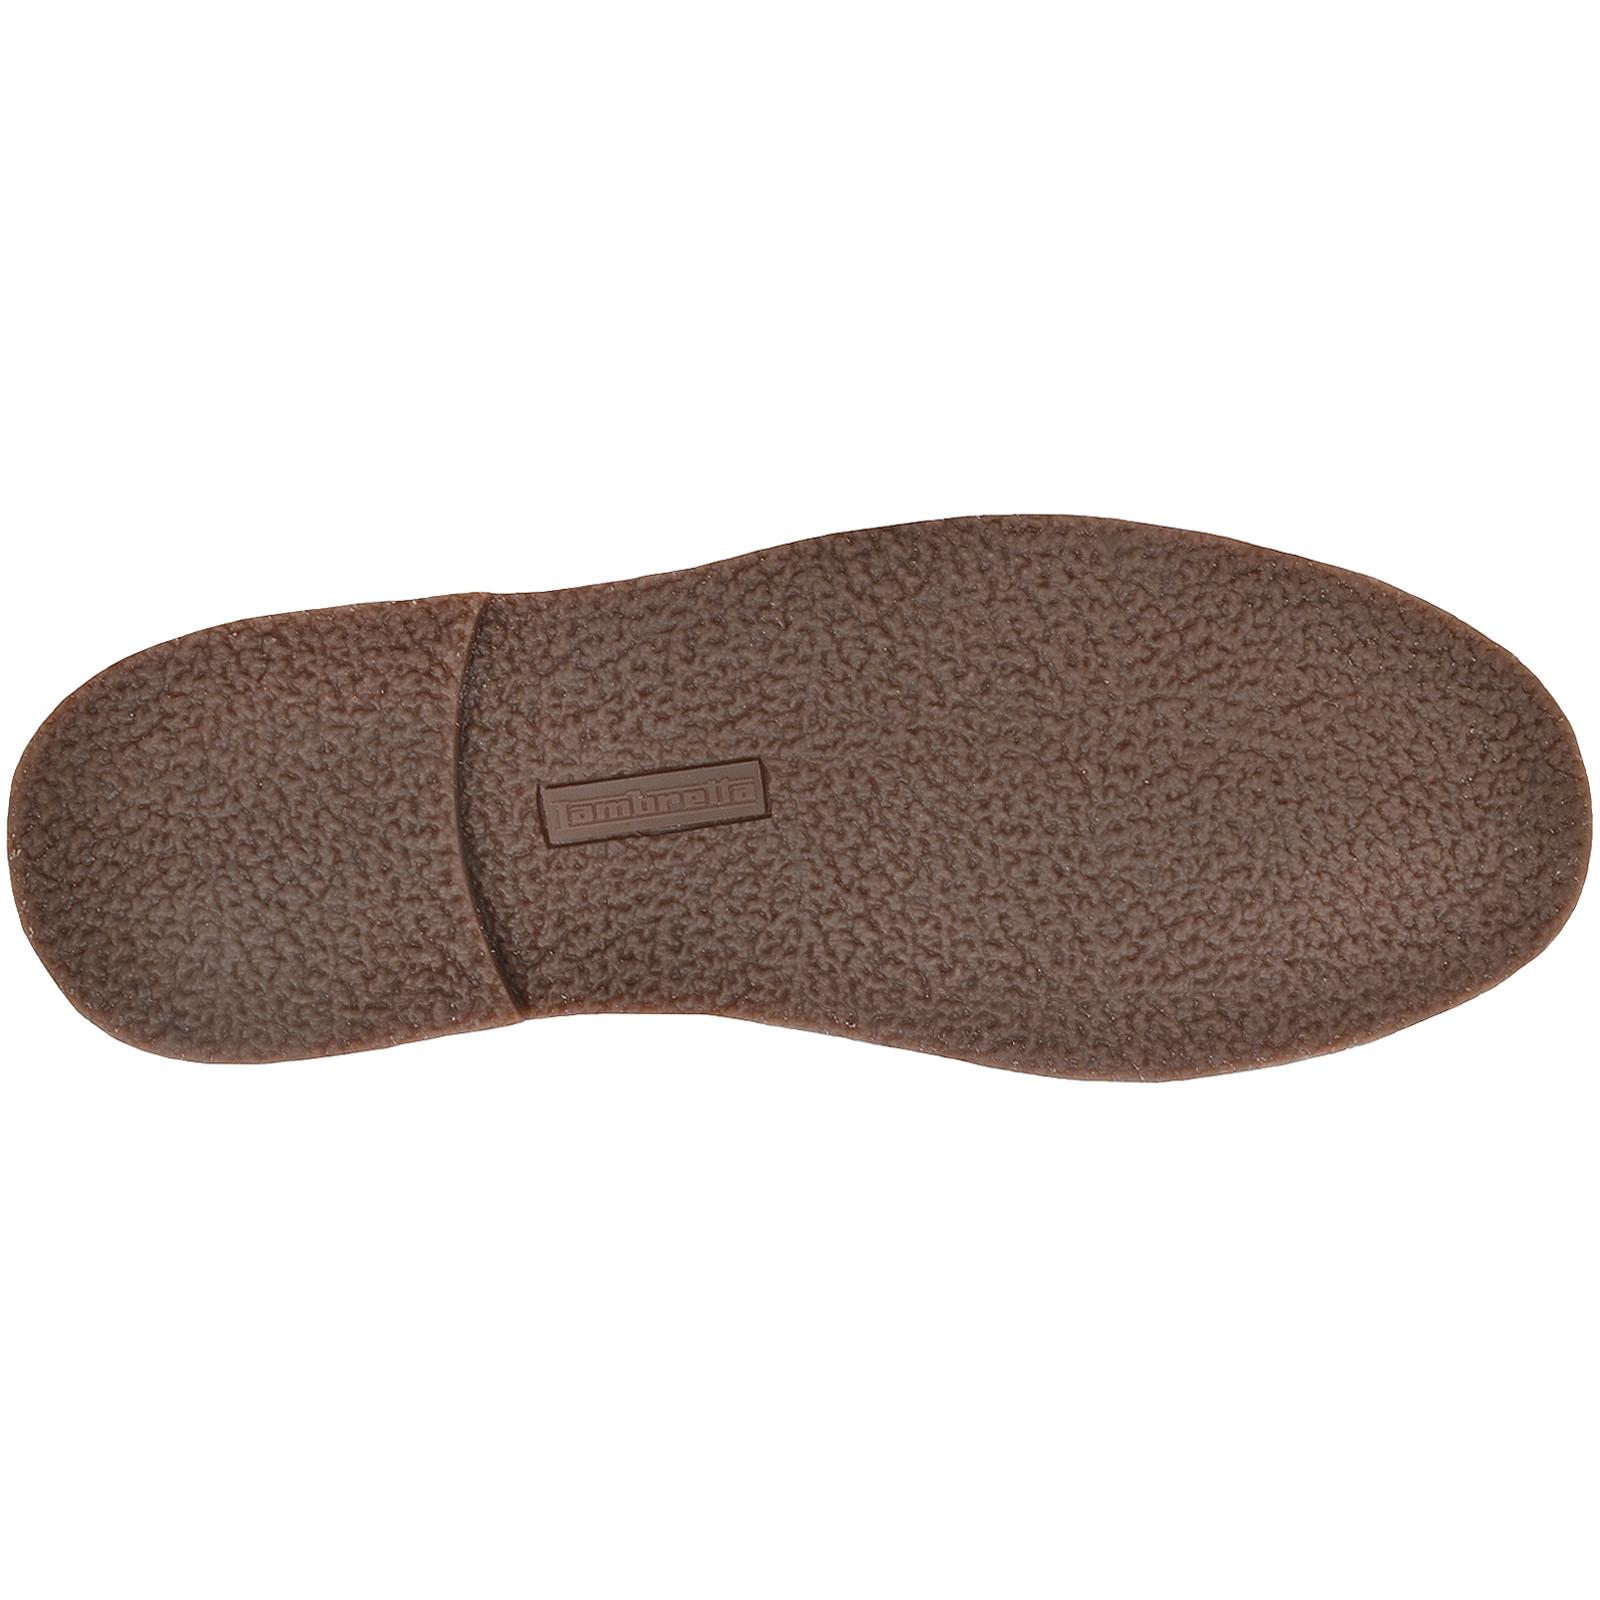 Selecter knöchel mens smart formalen wildleder knöchel Selecter lambretta desert Stiefel schuhe 0b93d2